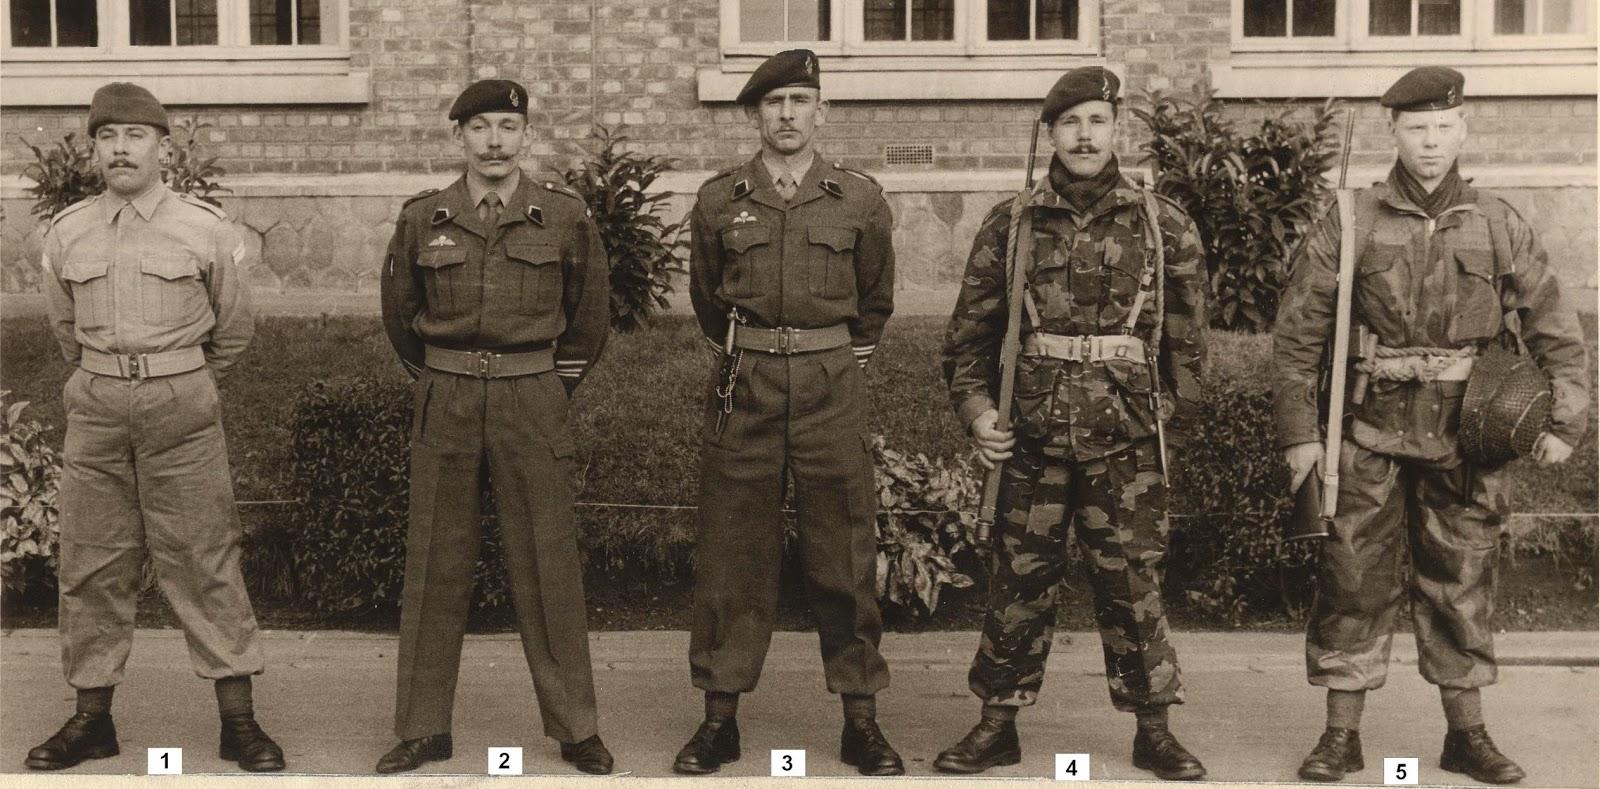 Military Equipment Of The 20th Century Belgian Uniforms